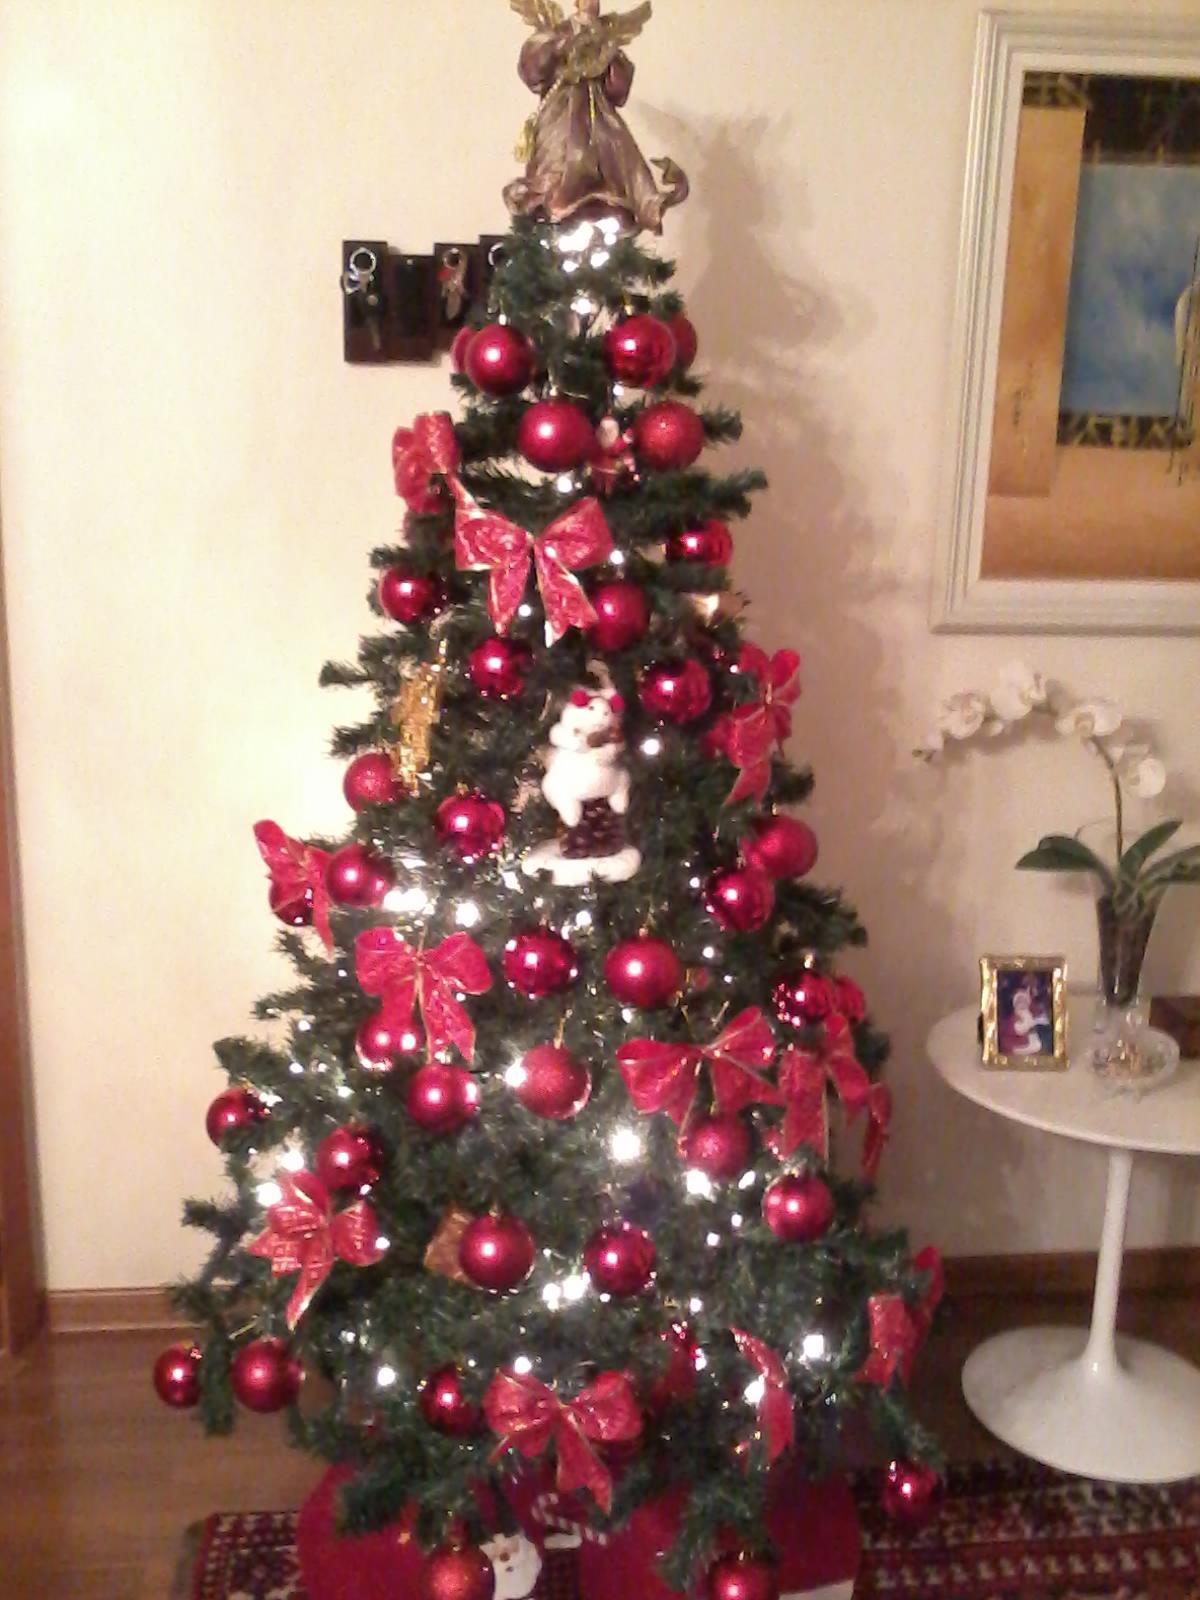 Arvore Natal 2~ Decoracao De Arvore De Natal Imagens